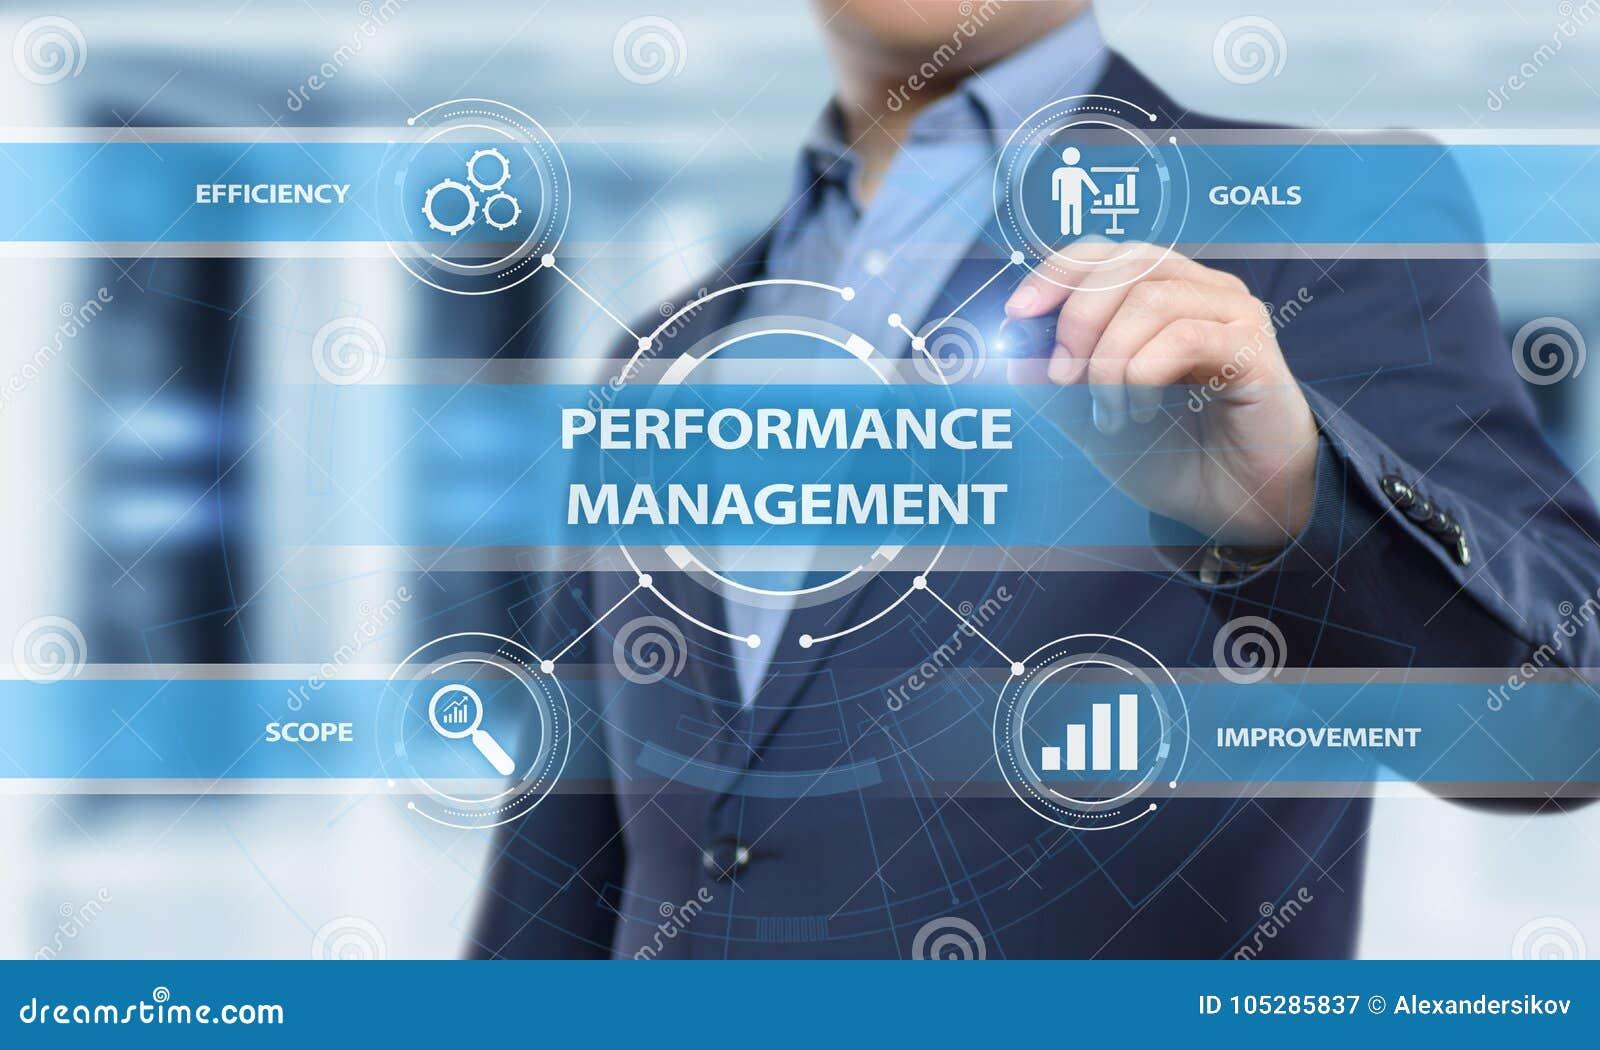 Performance Technology: Performance Management Efficiency Improvement Business